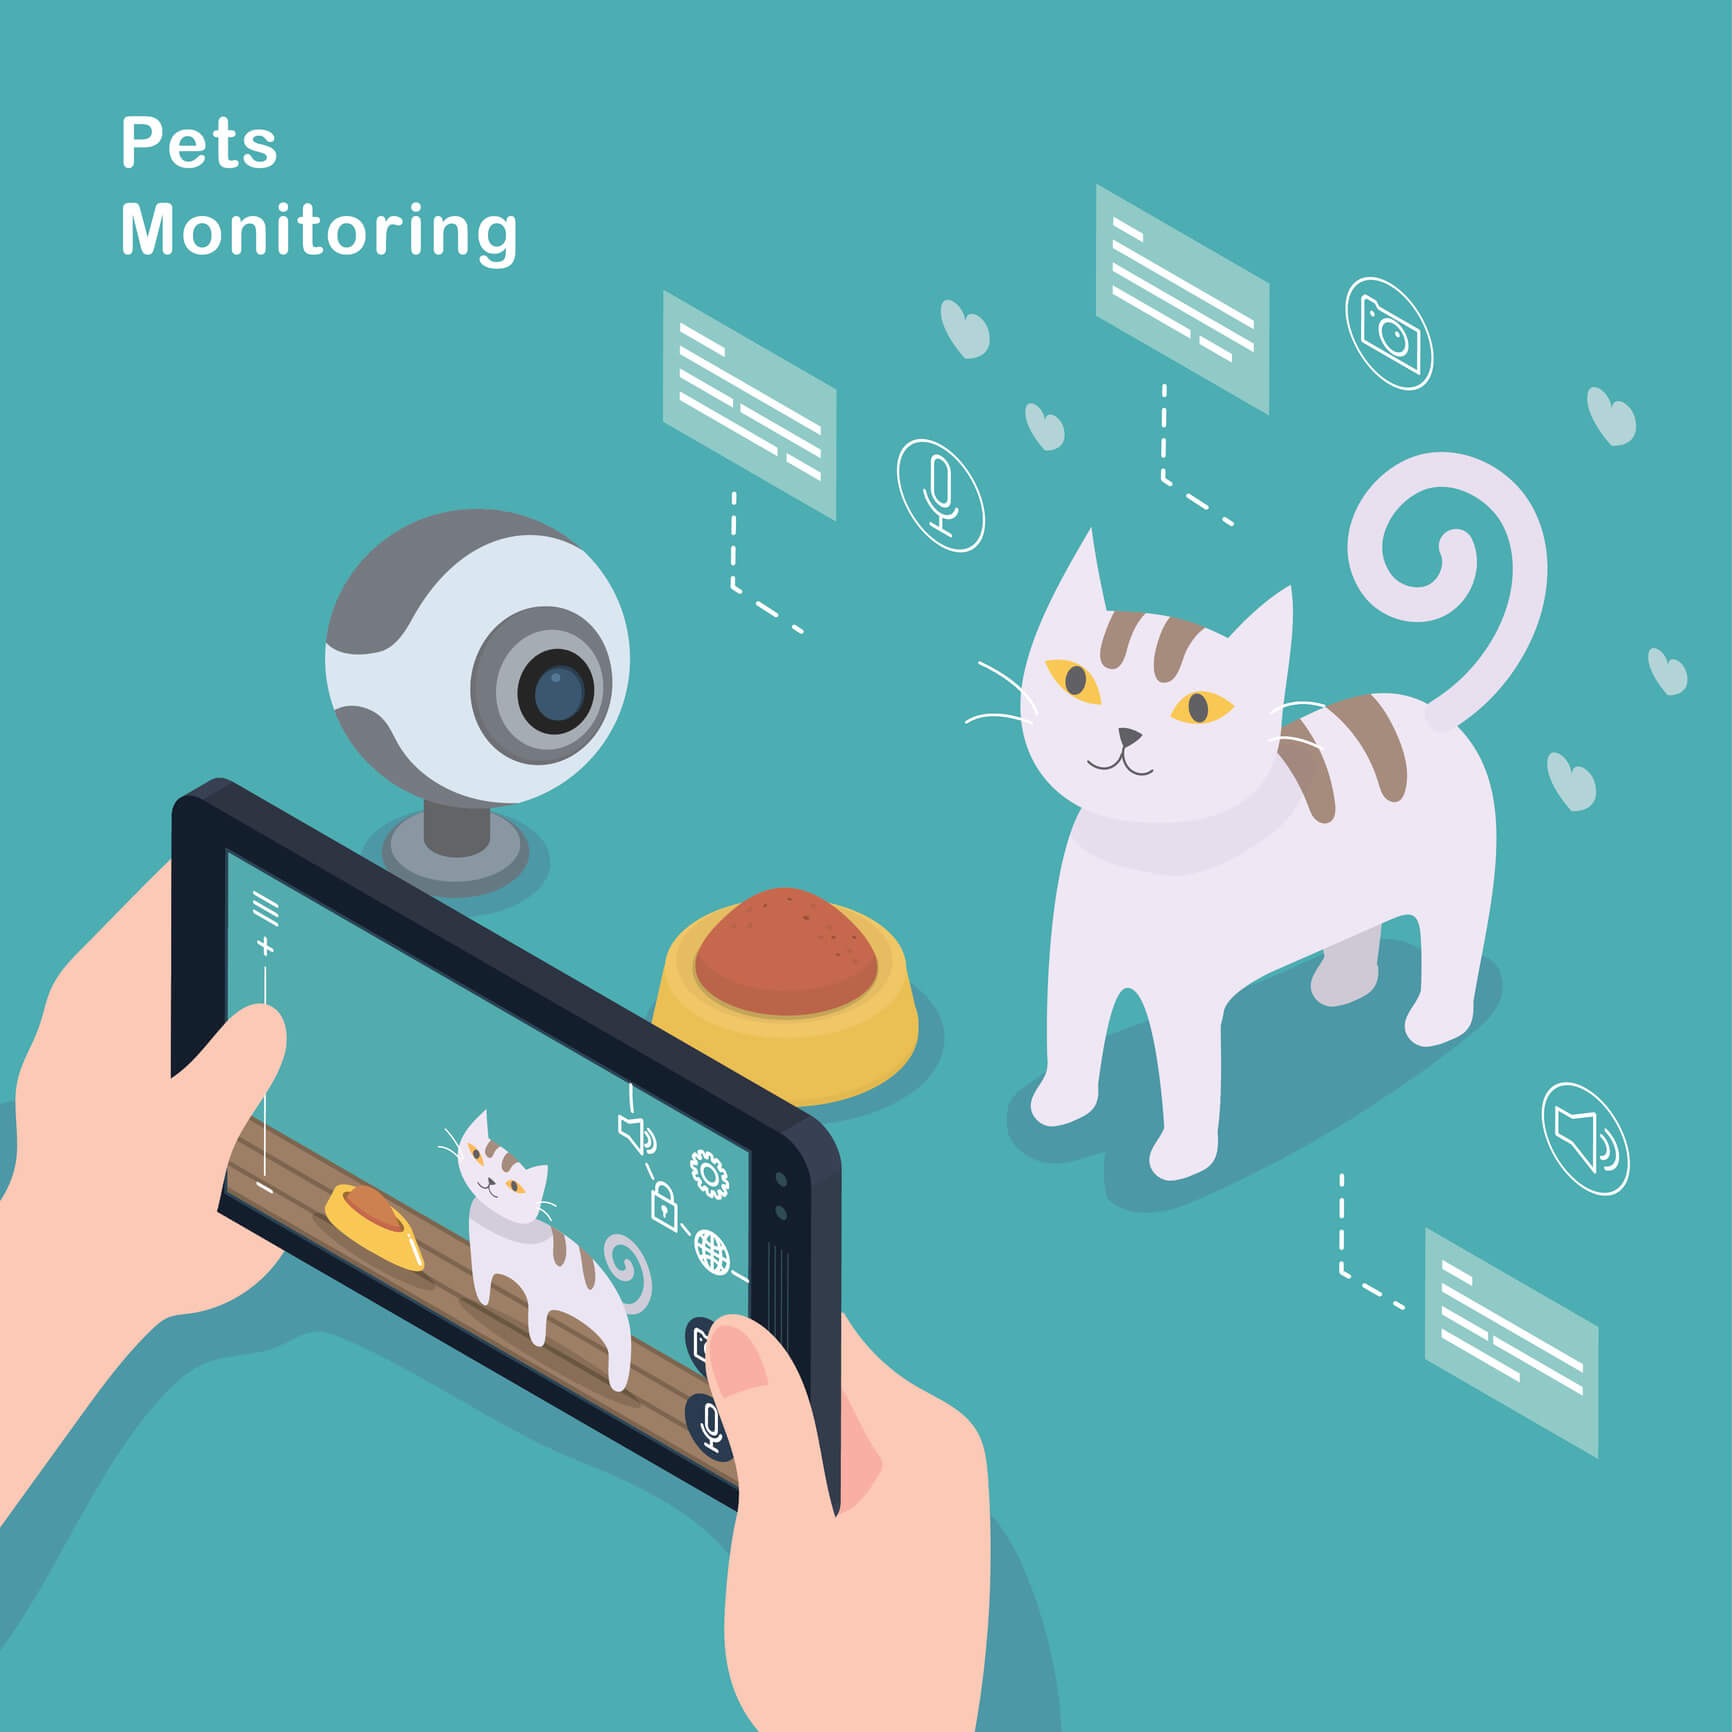 smart-home-pet-monitoring-c.jpg